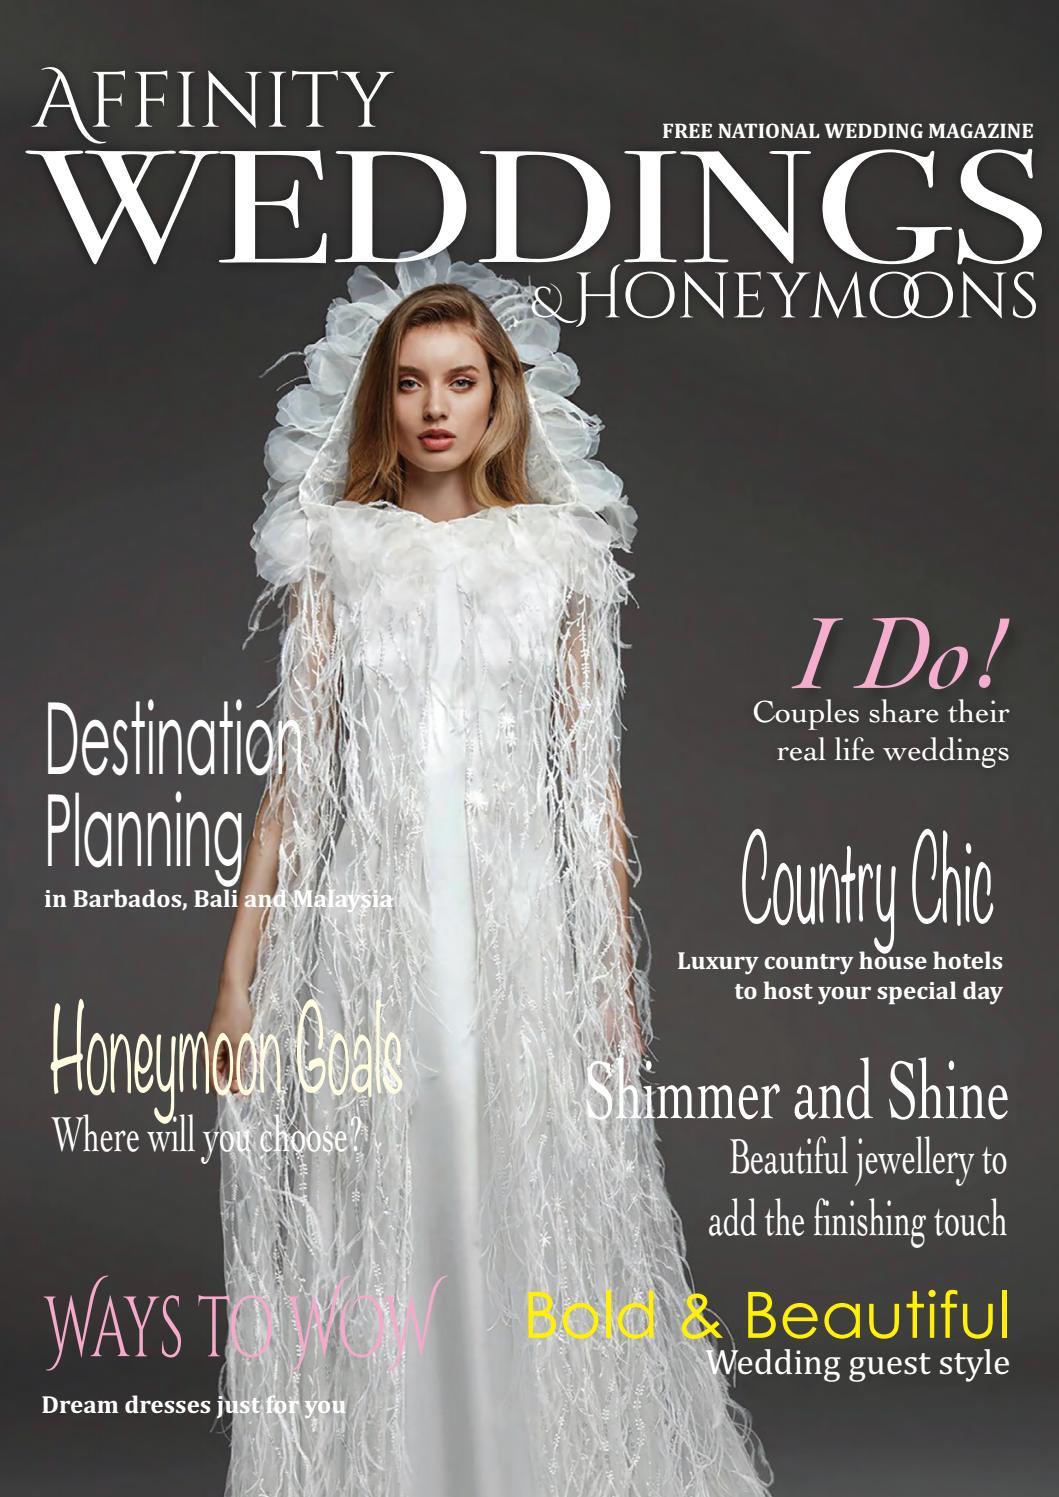 2013f15de860 Affinity Weddings & Honeymoons Spring 2019 by jane fry - issuu